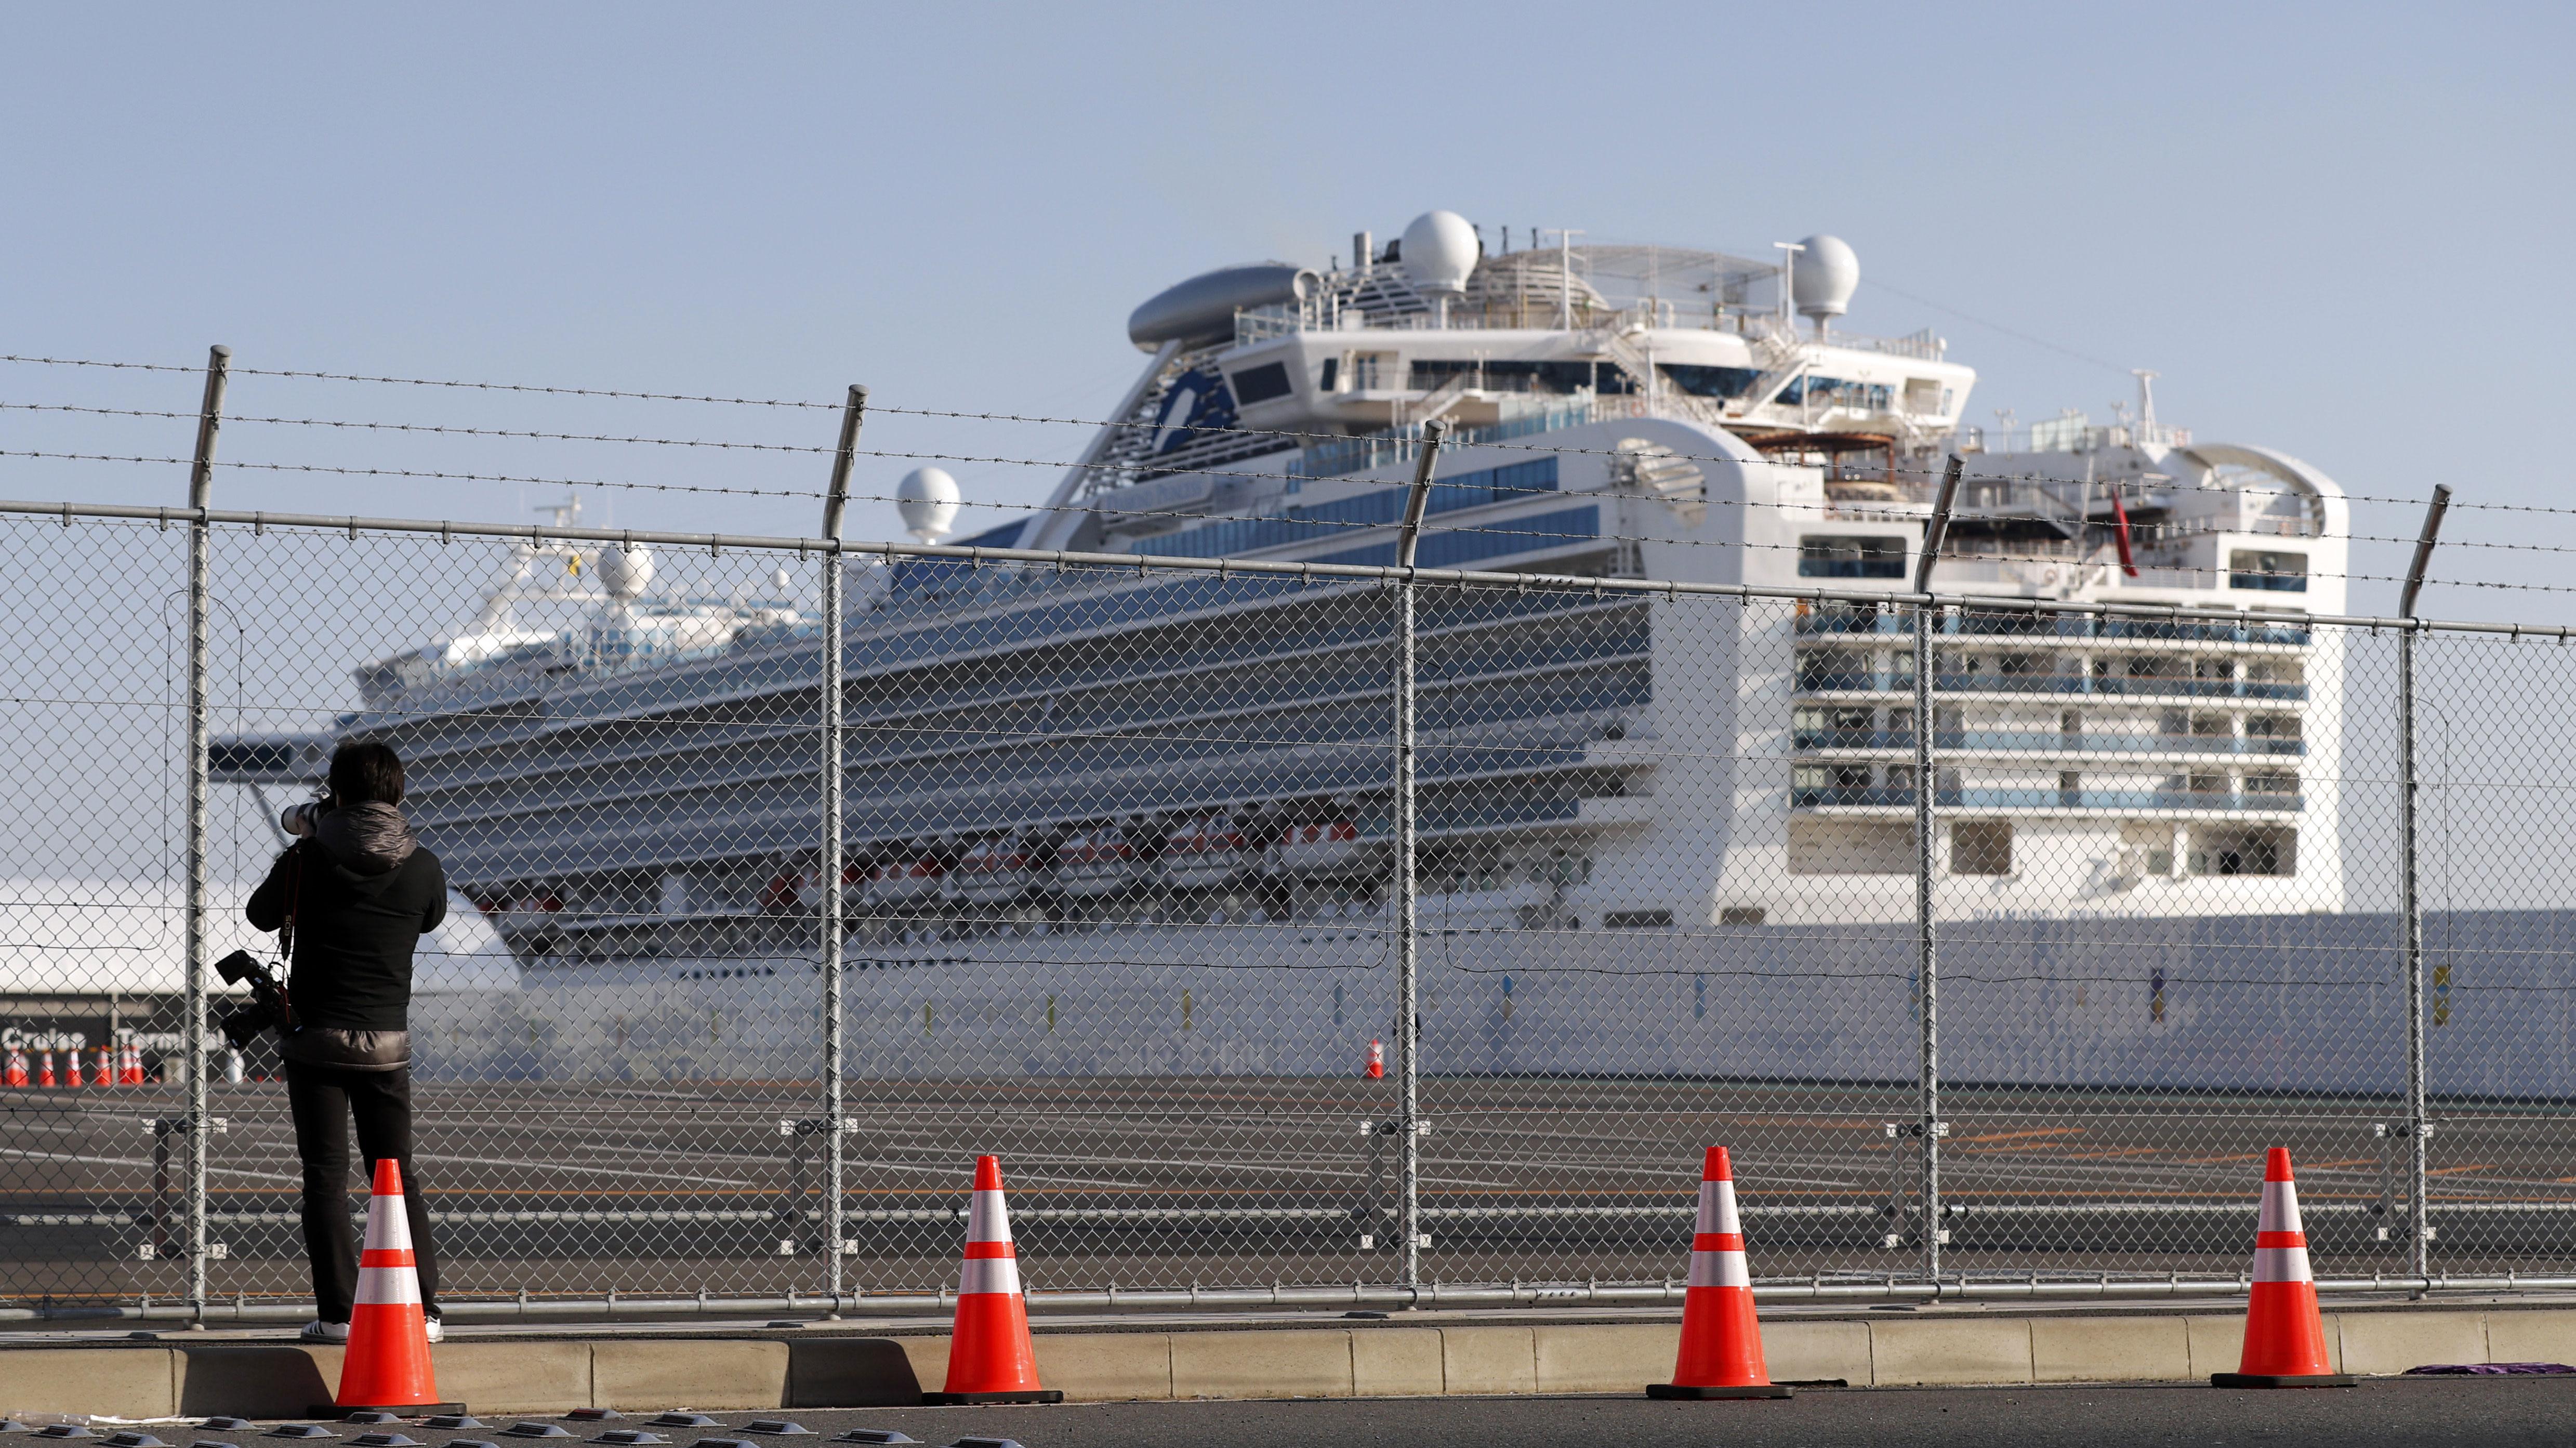 Informan muerte de tercer pasajero del crucero Diamond Princess pero no confirman si fue producto del coronavirus